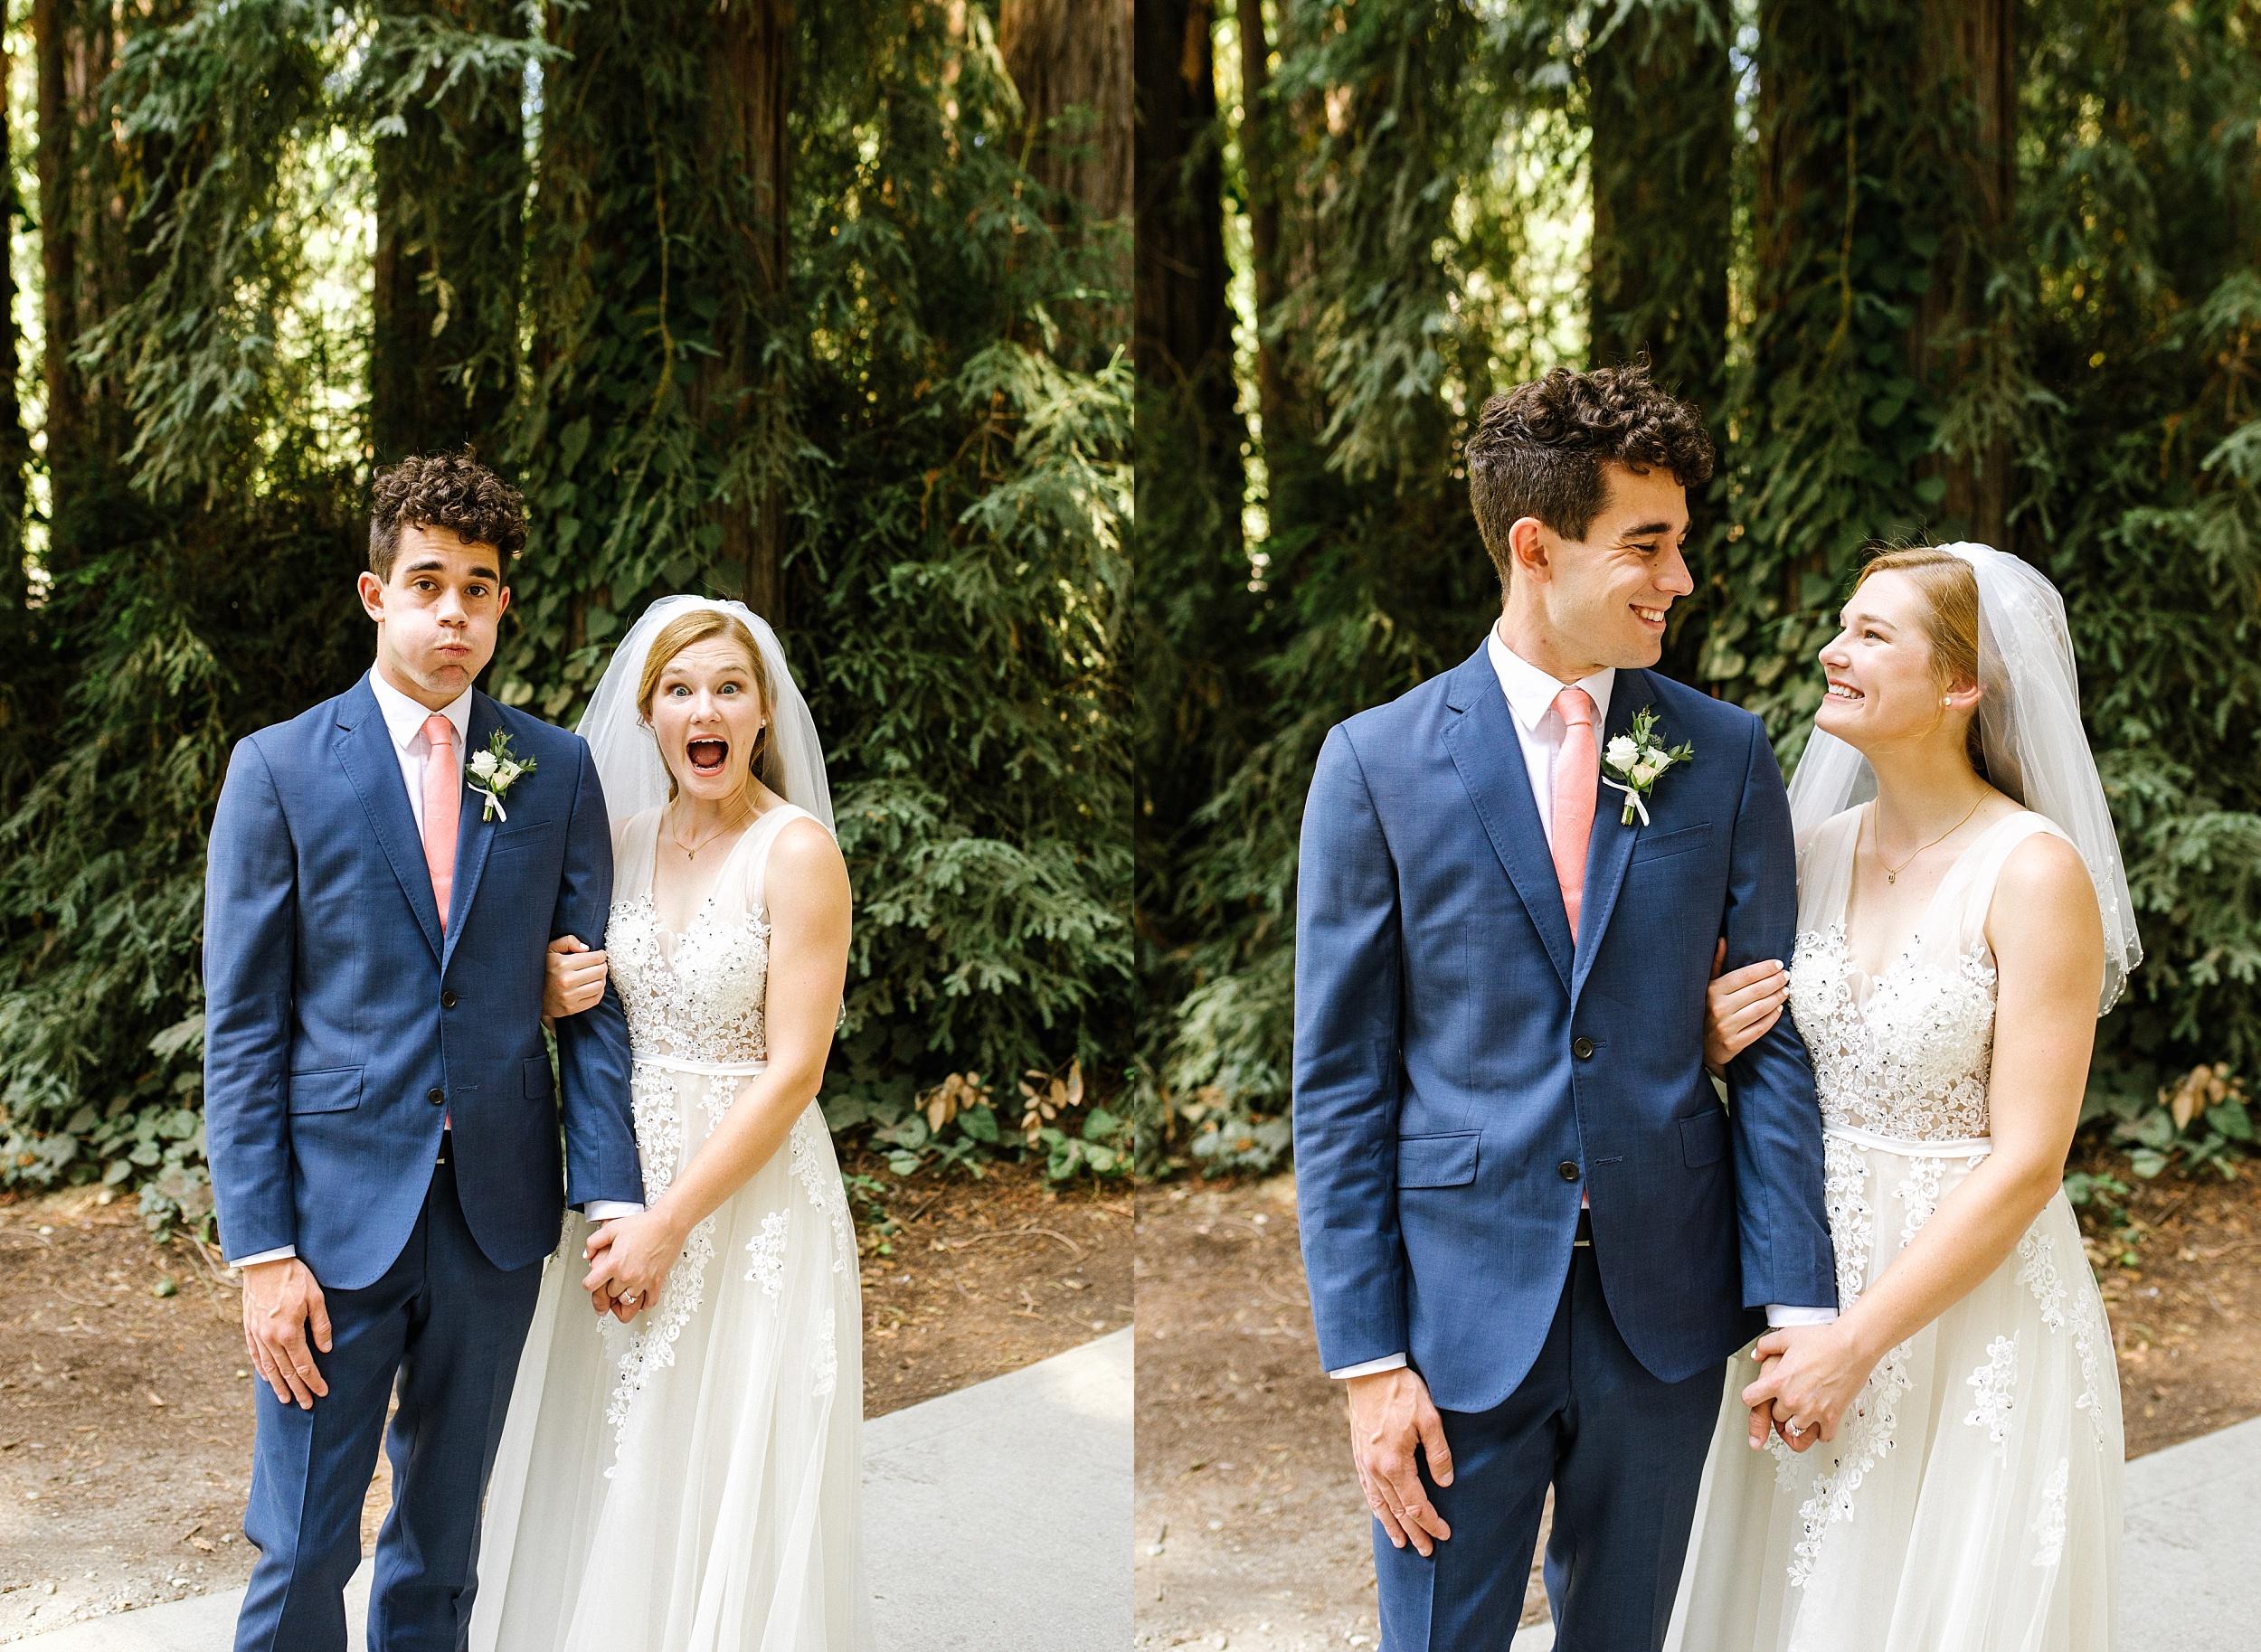 Amphitheatre-of-the-Redwoods-wedding-erikariley_chelsea-dier-photography_0010.jpg